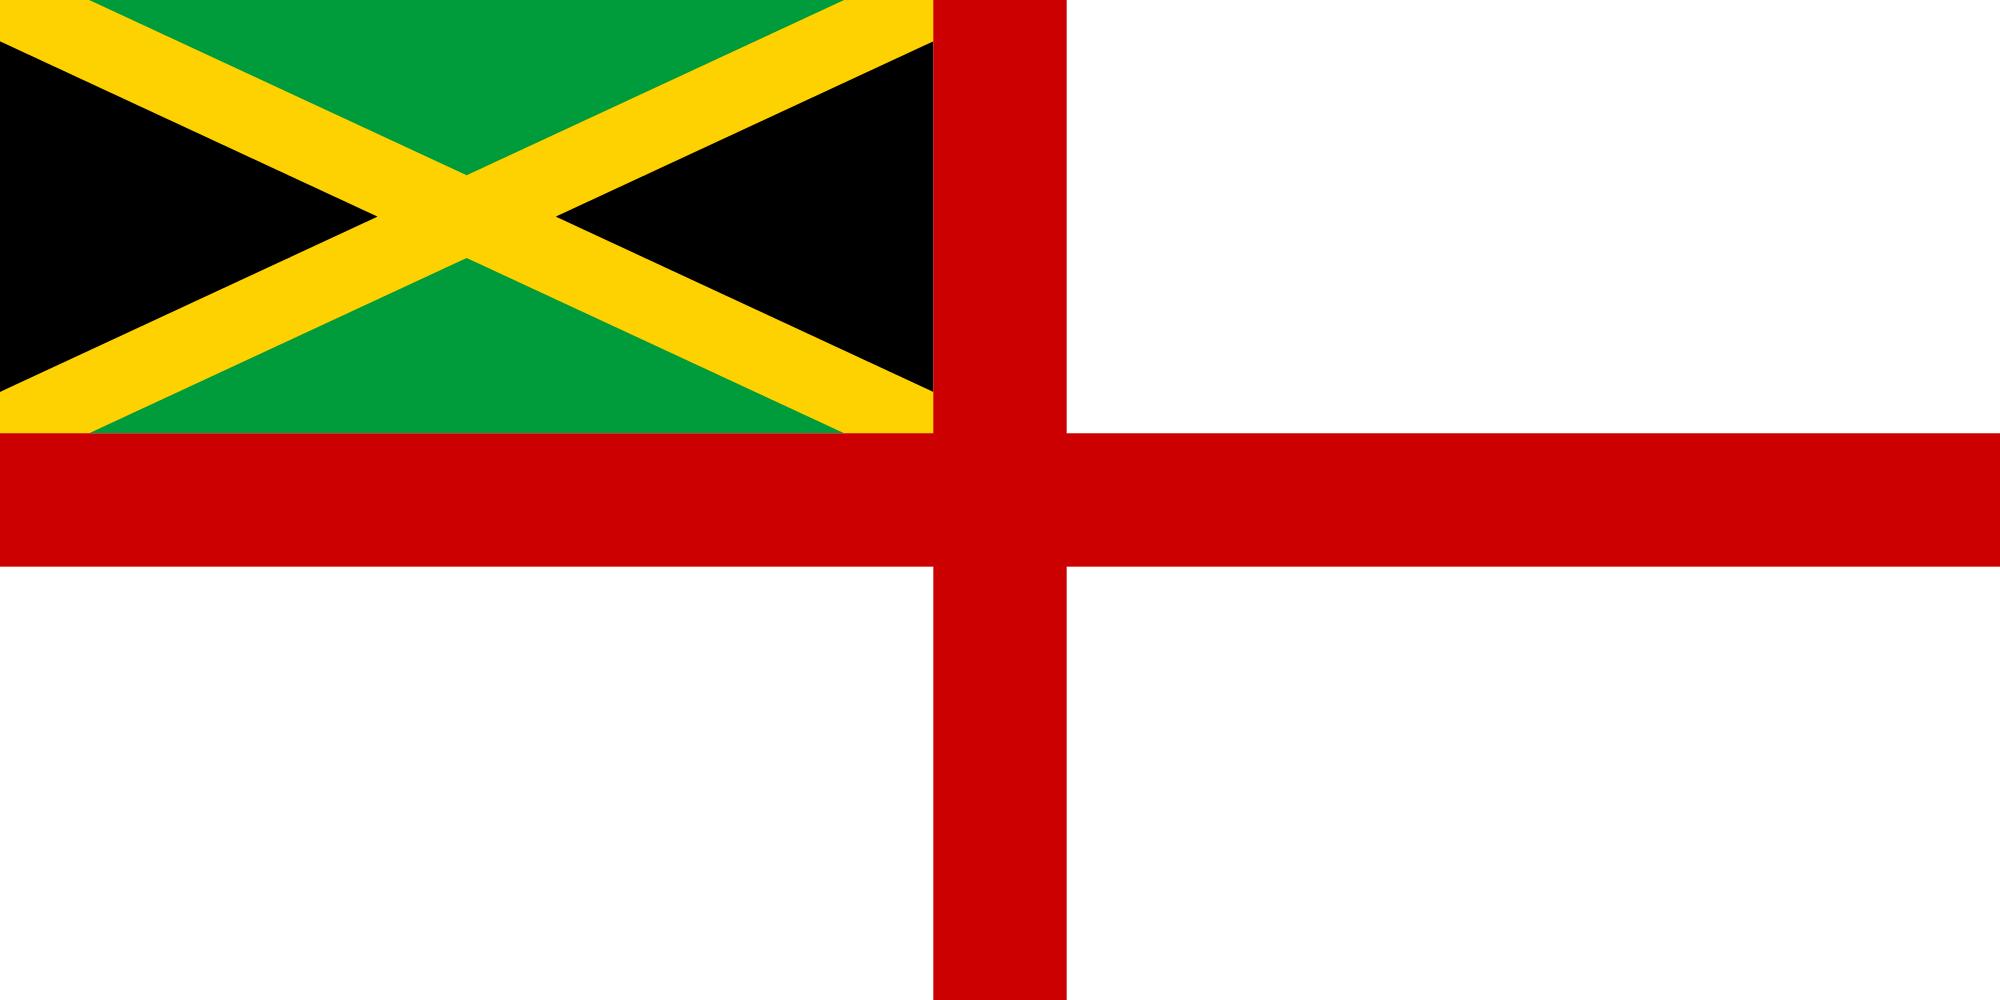 Jamaica (Naval ensign)